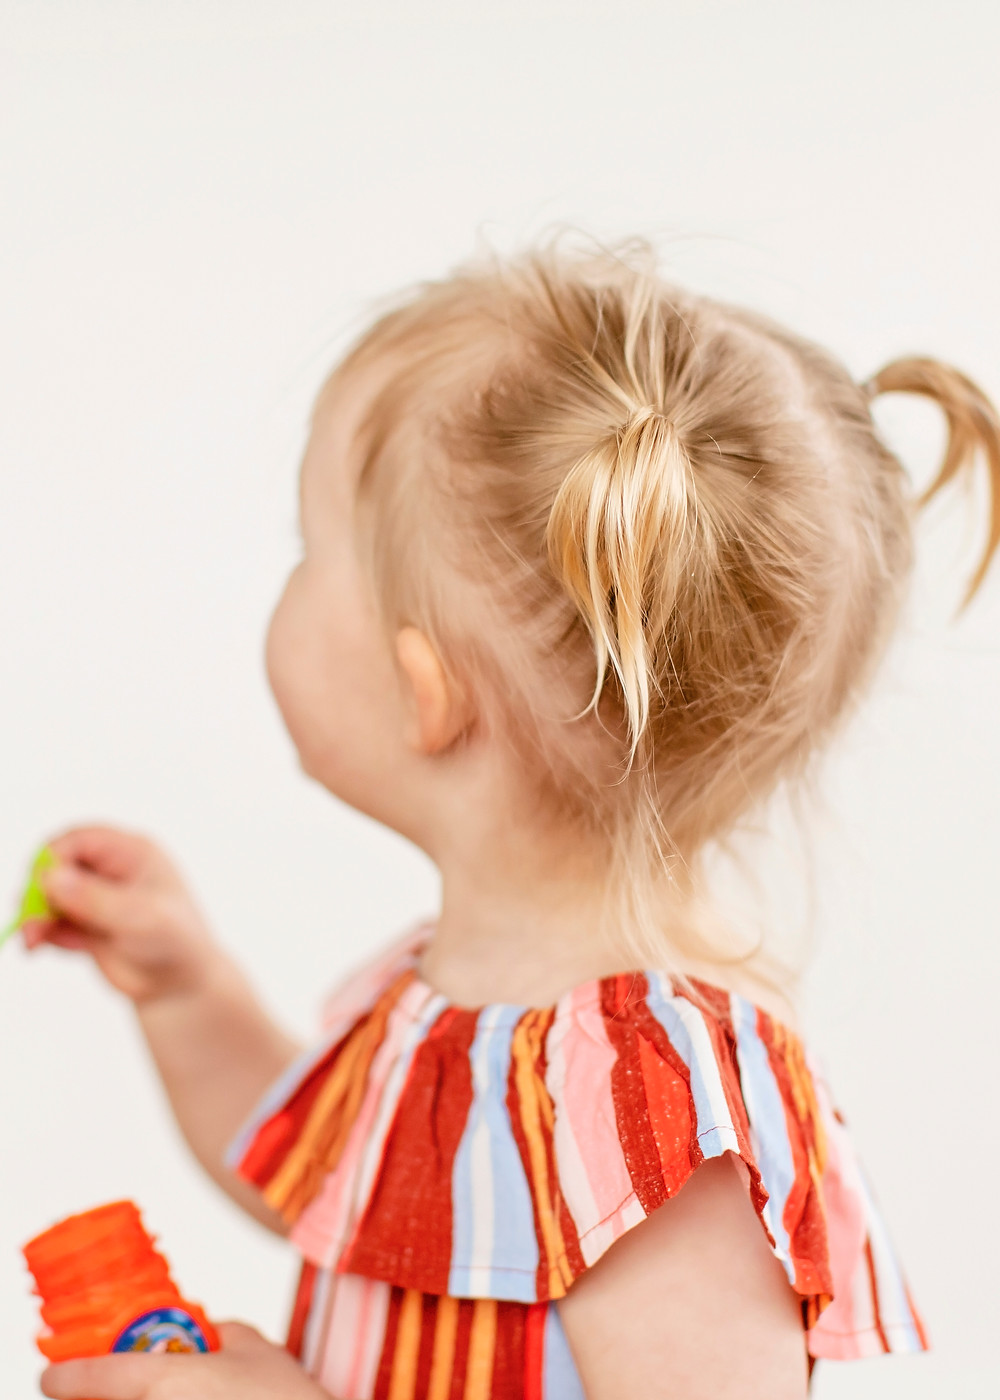 Fargo Kids Photographer, Lemon Drops Photography